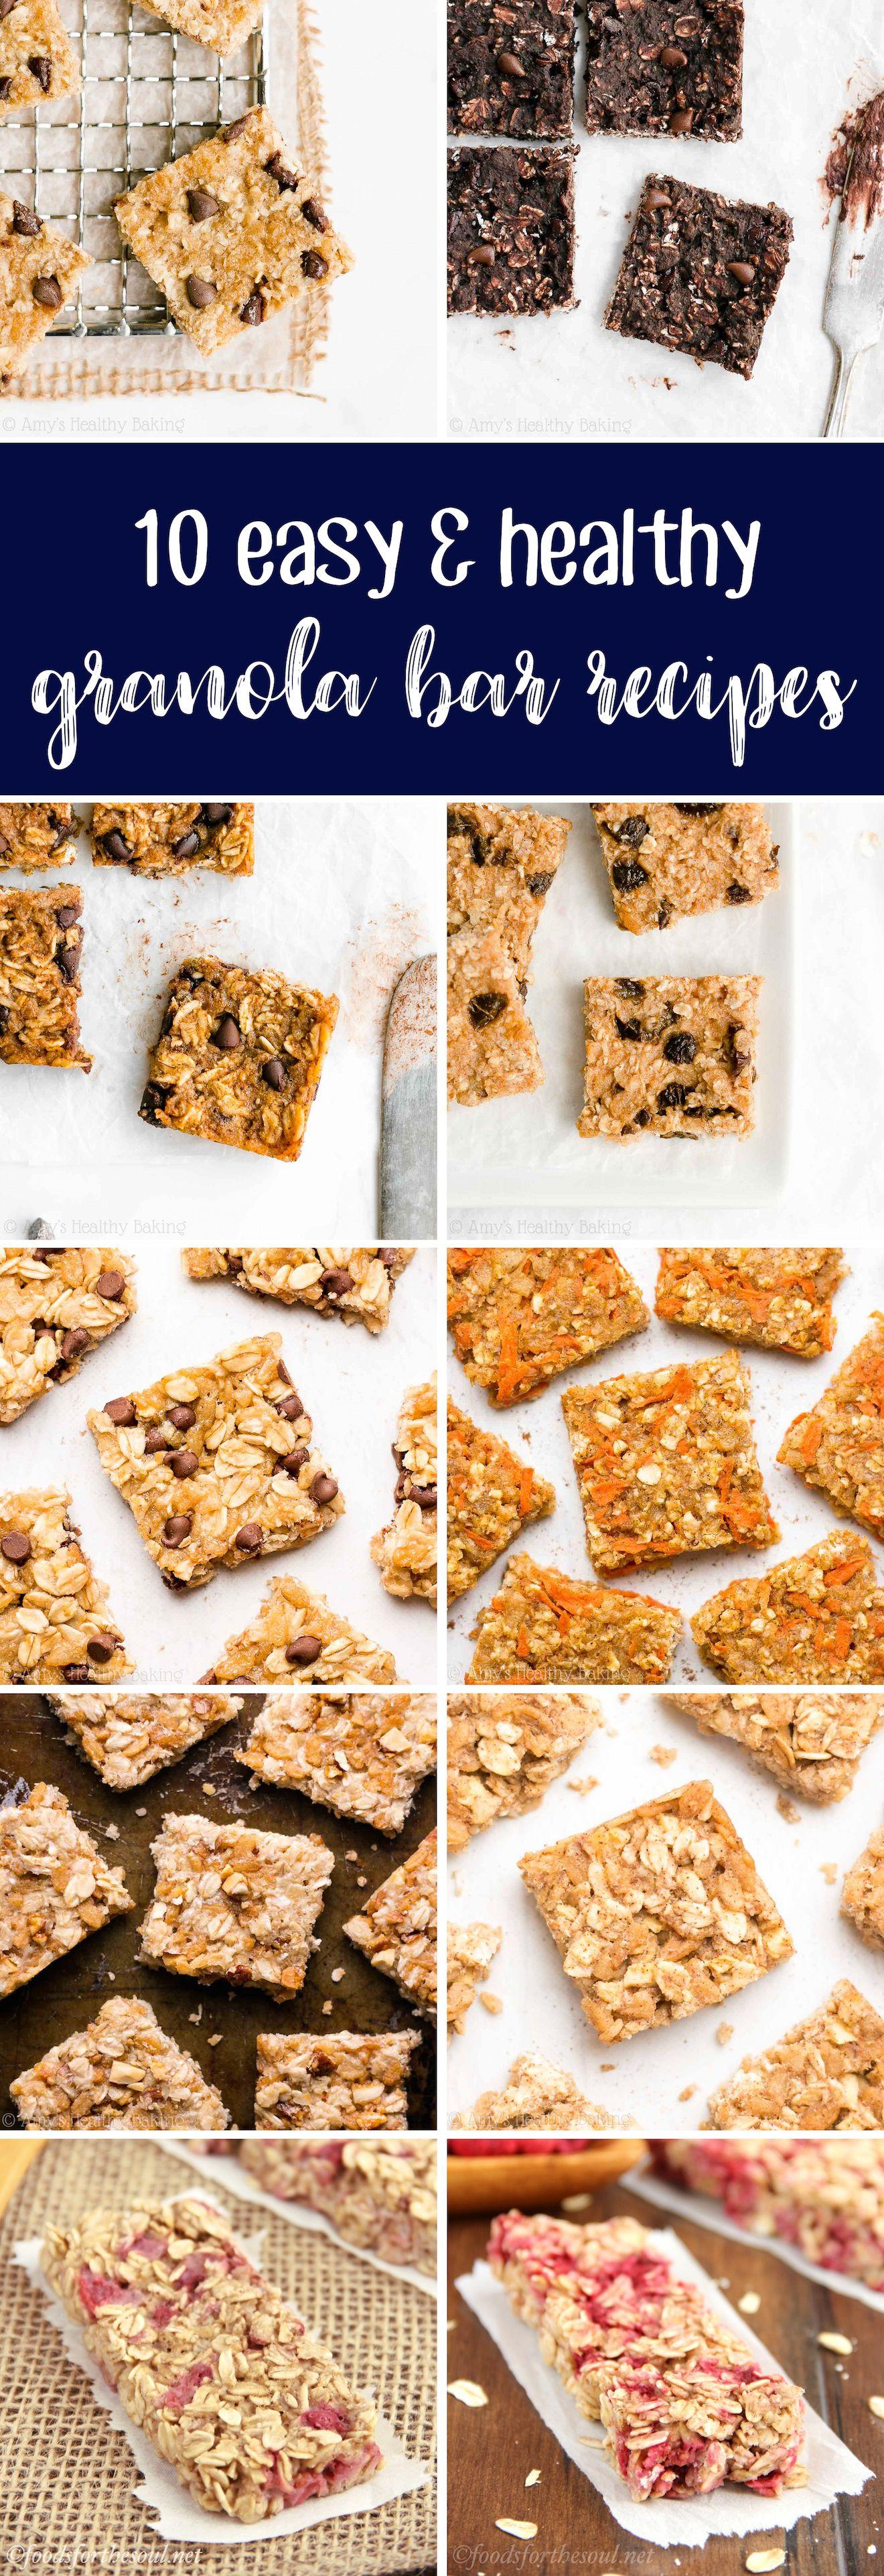 10 Easy Healthy Granola Bar Recipes All Are Gluten Free With No Refined Flour Or Sugar In 2020 Granola Recipe Bars Healthy Granola Bars Granola Bar Recipe Healthy